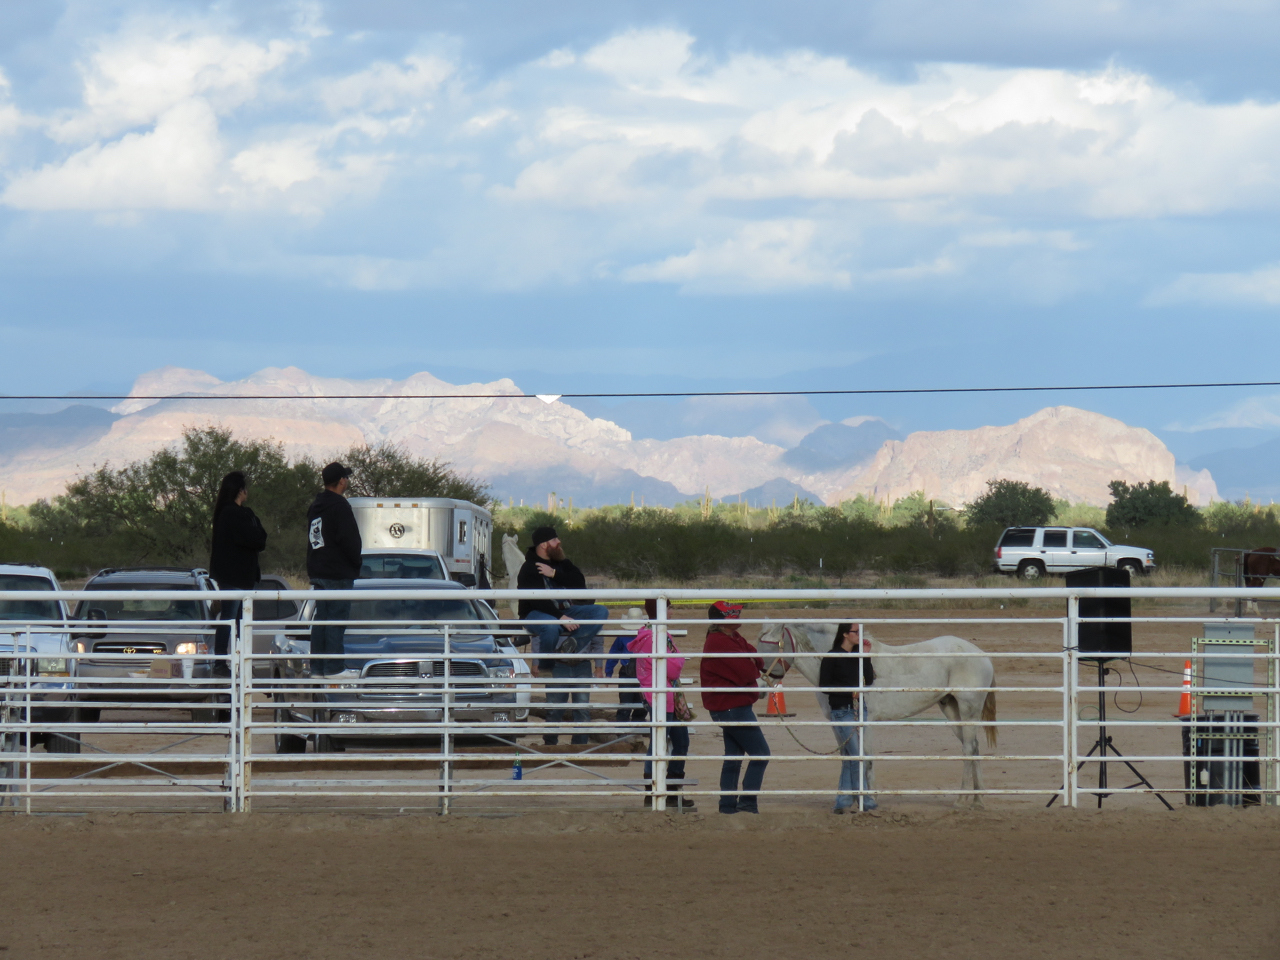 2016-11-27 Rodeo B - 127320.jpg